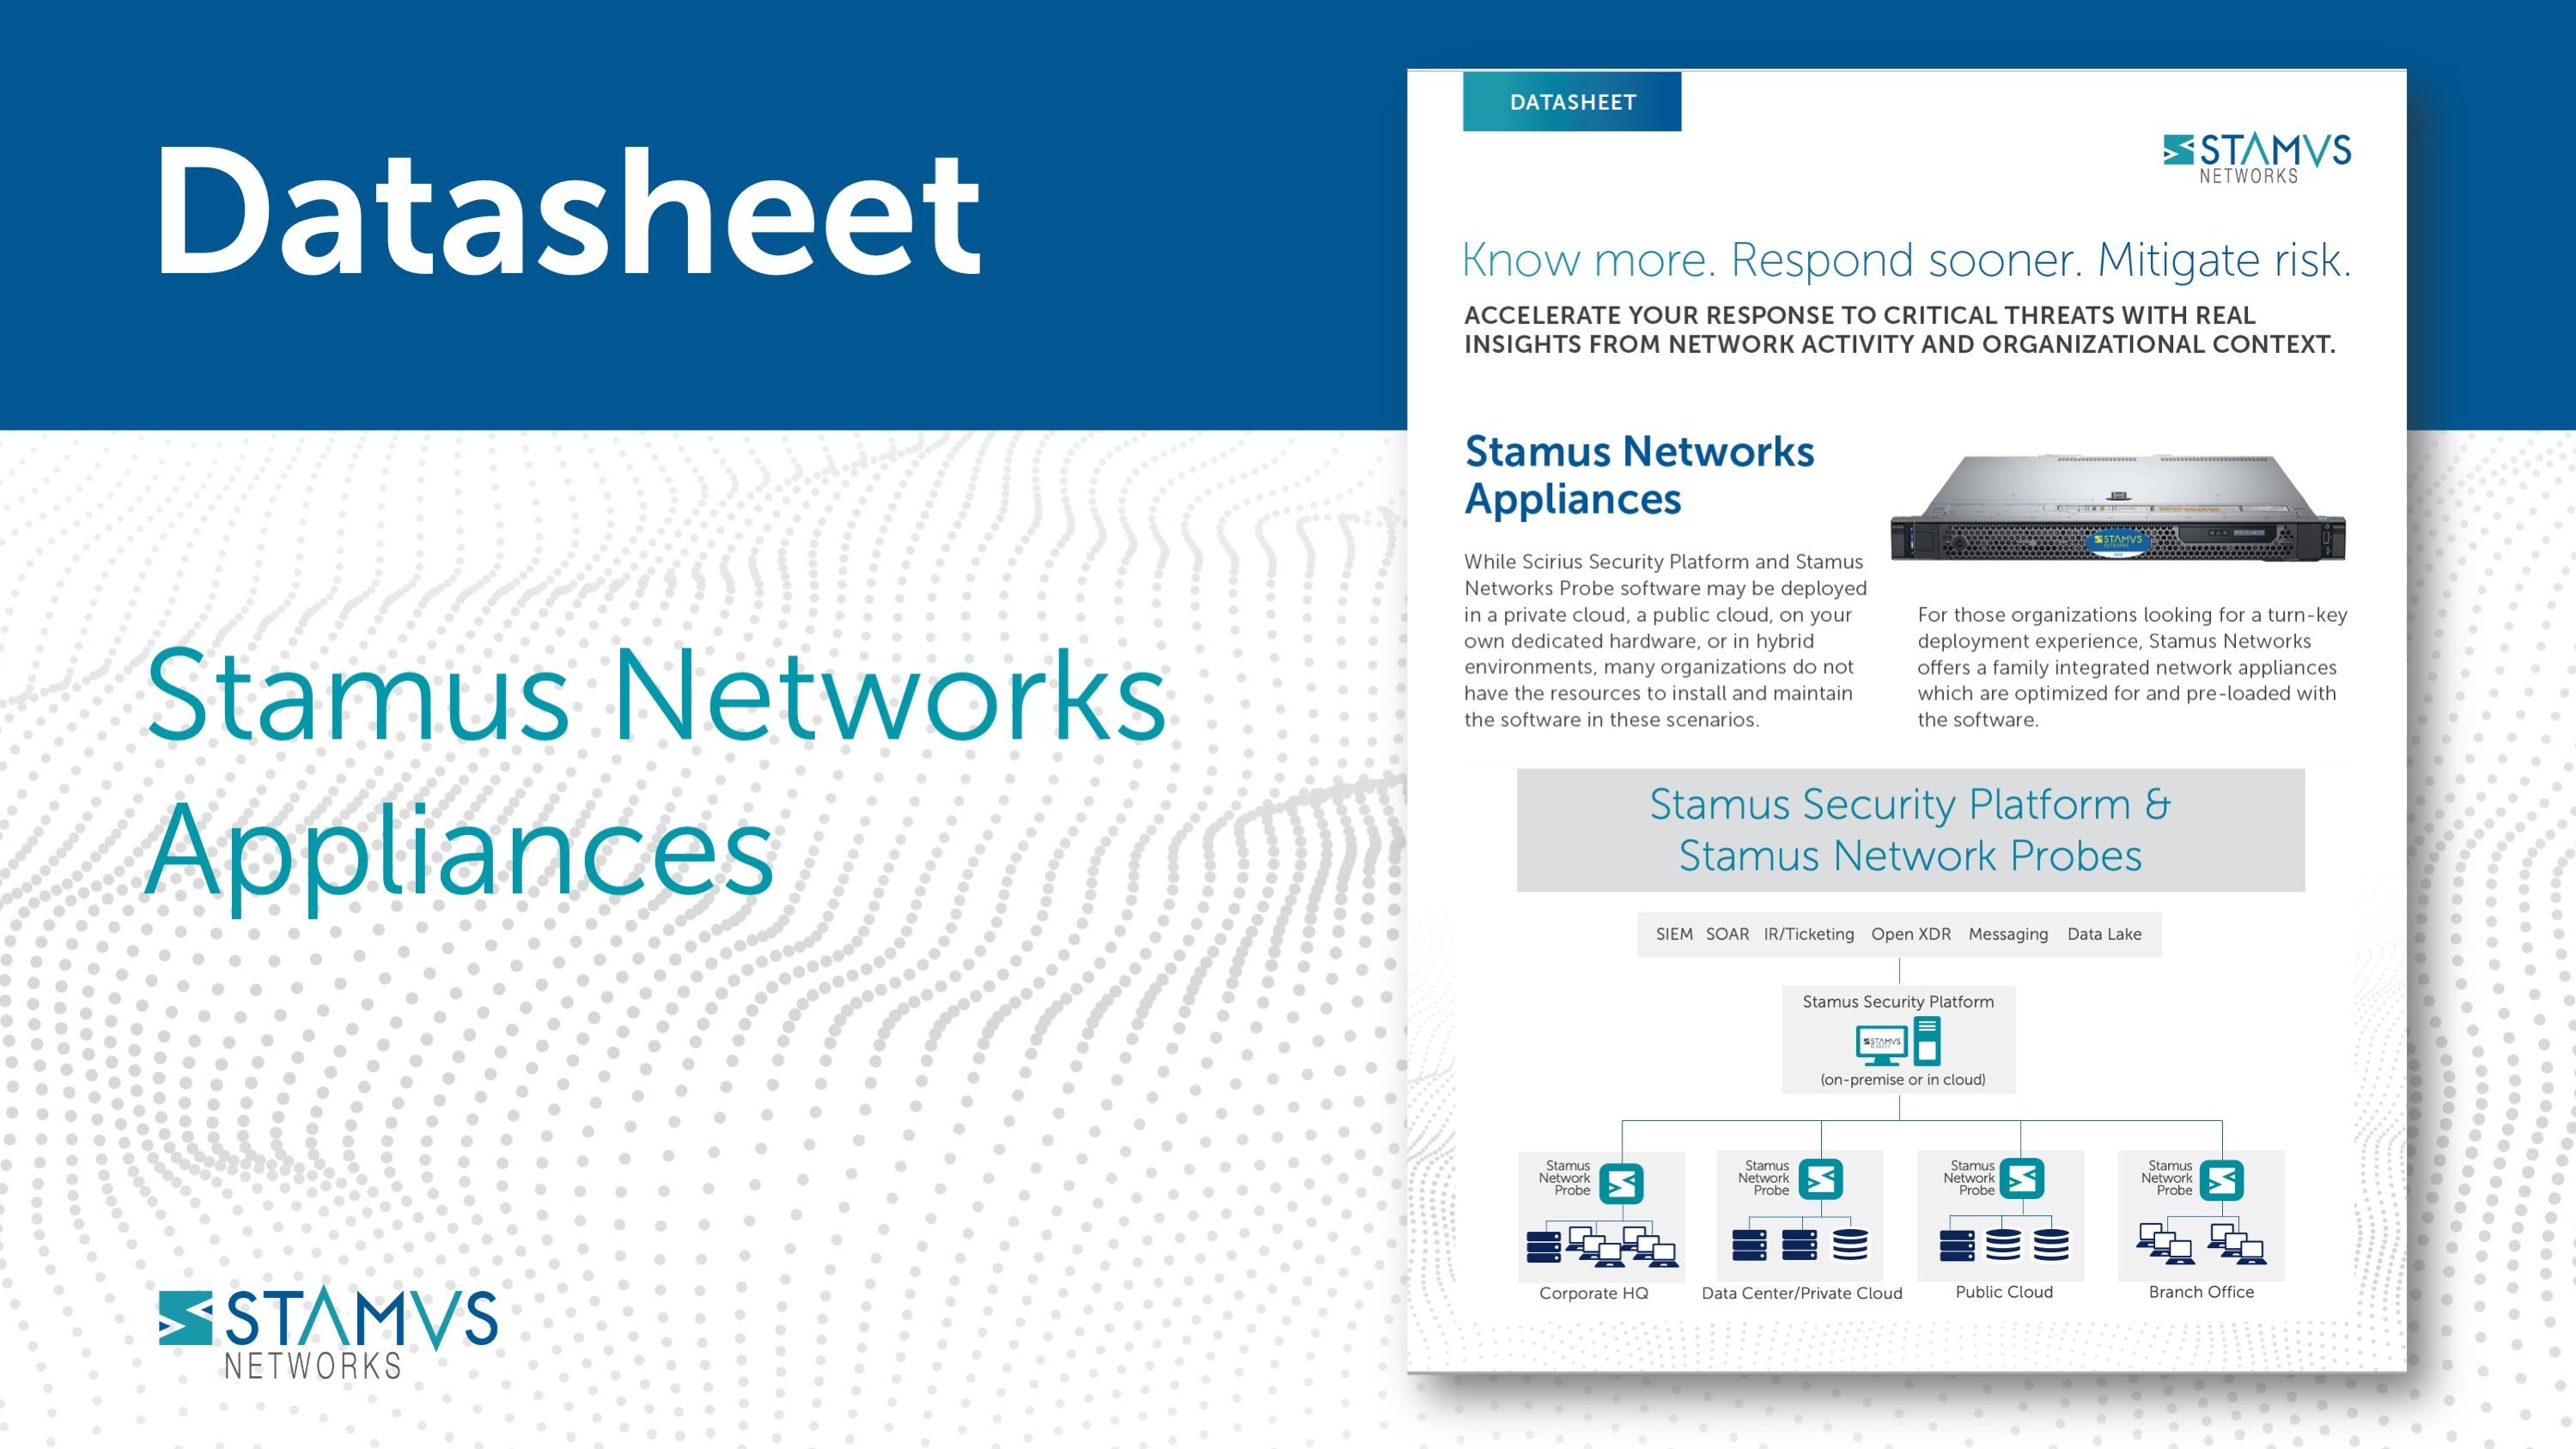 Stamus Networks Appliances